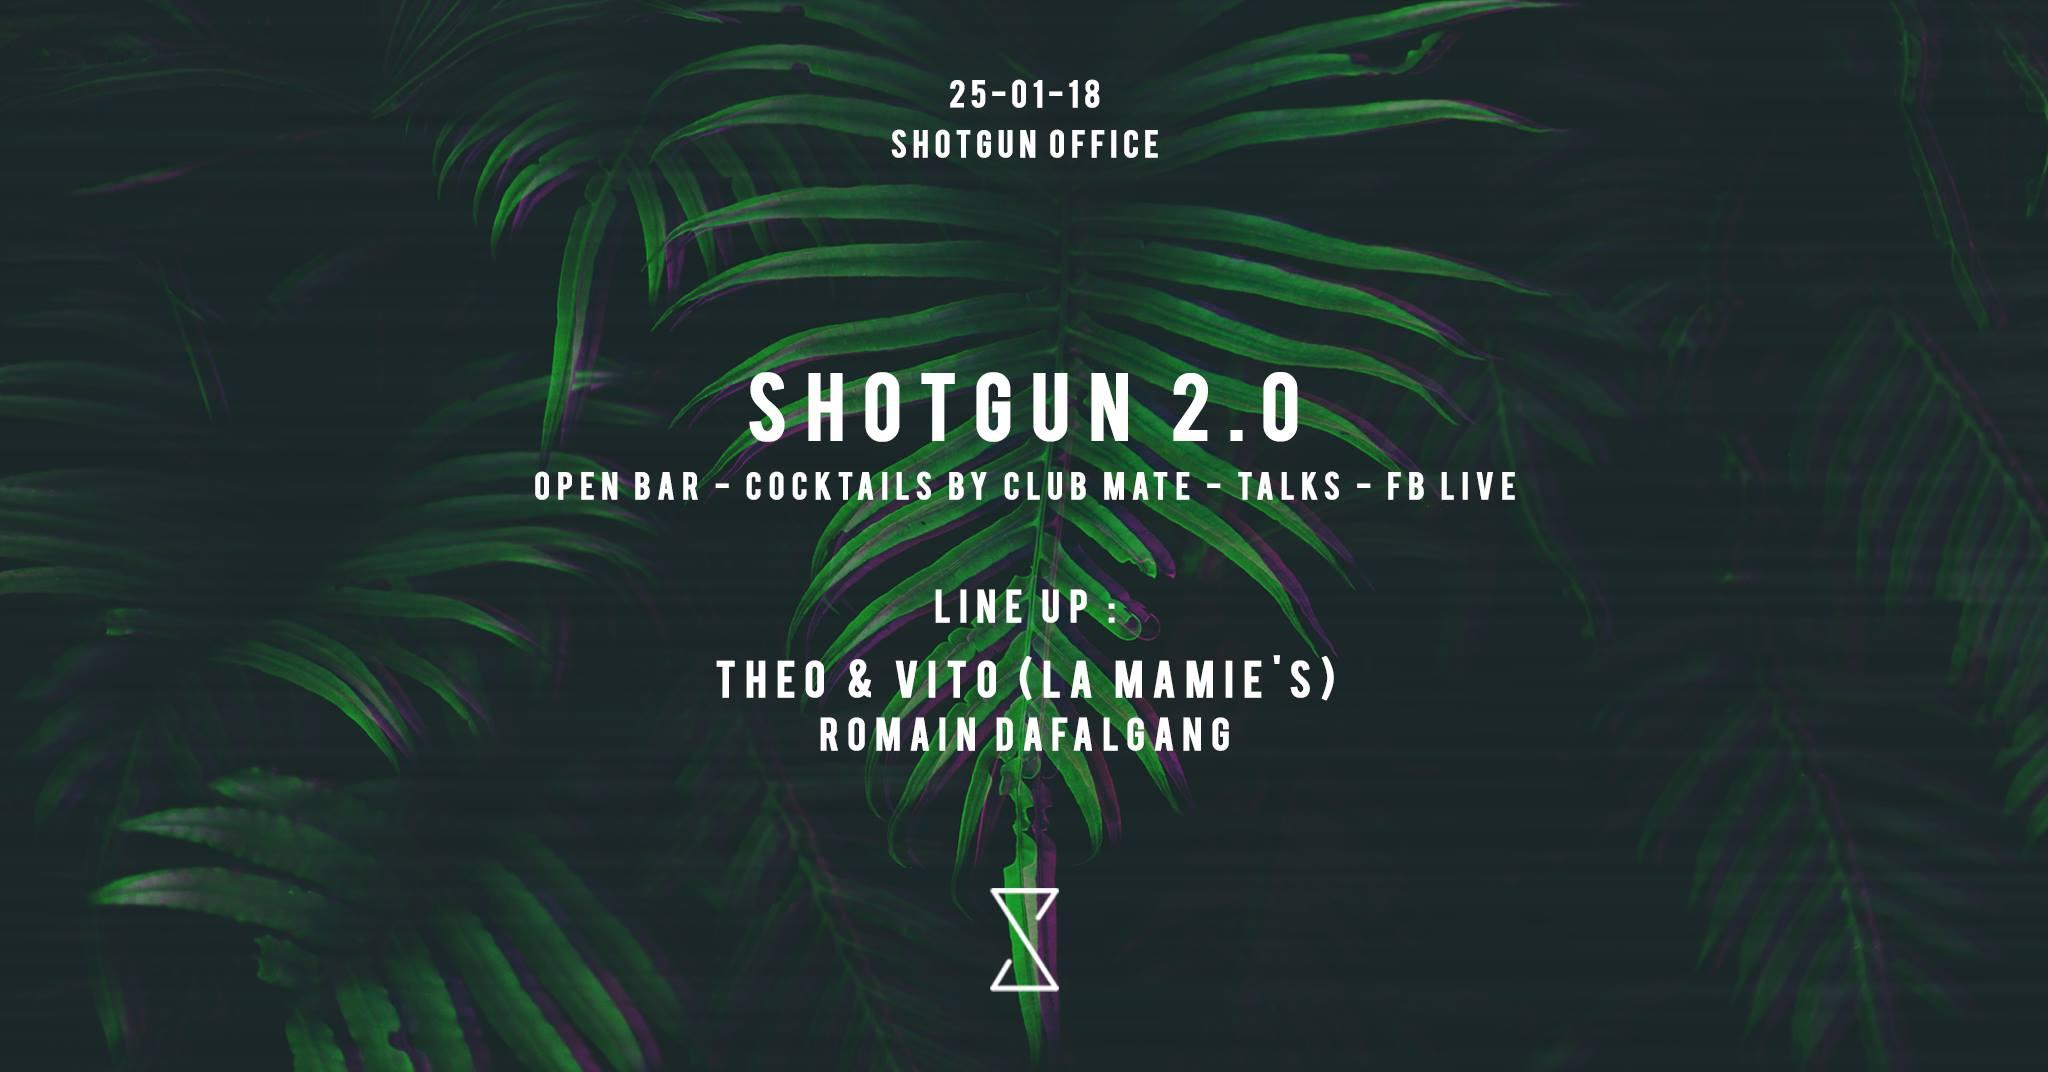 SHOTGUN 2.0 [ INAUGURATION ]